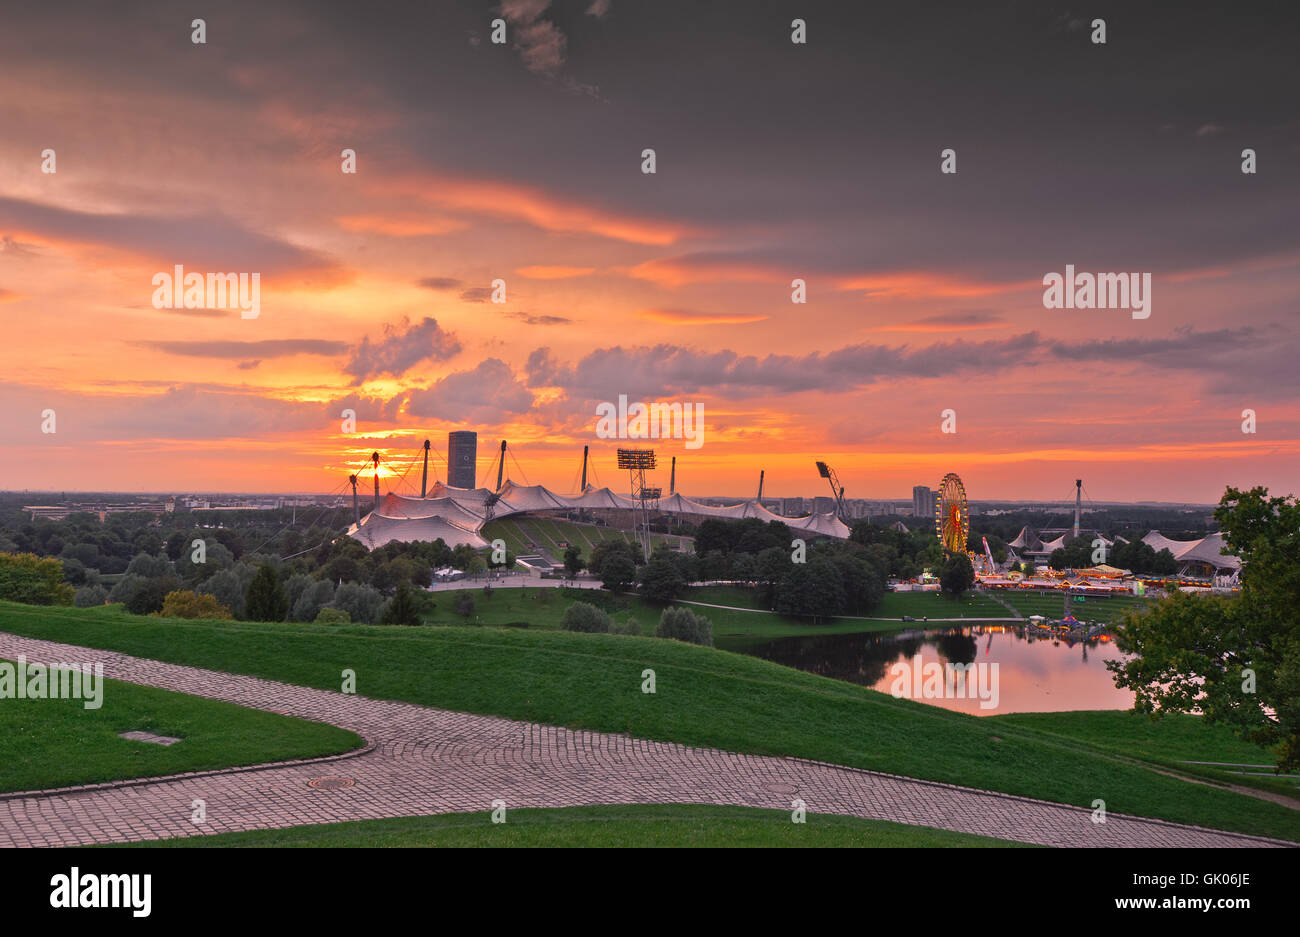 olympiapark - Stock Image